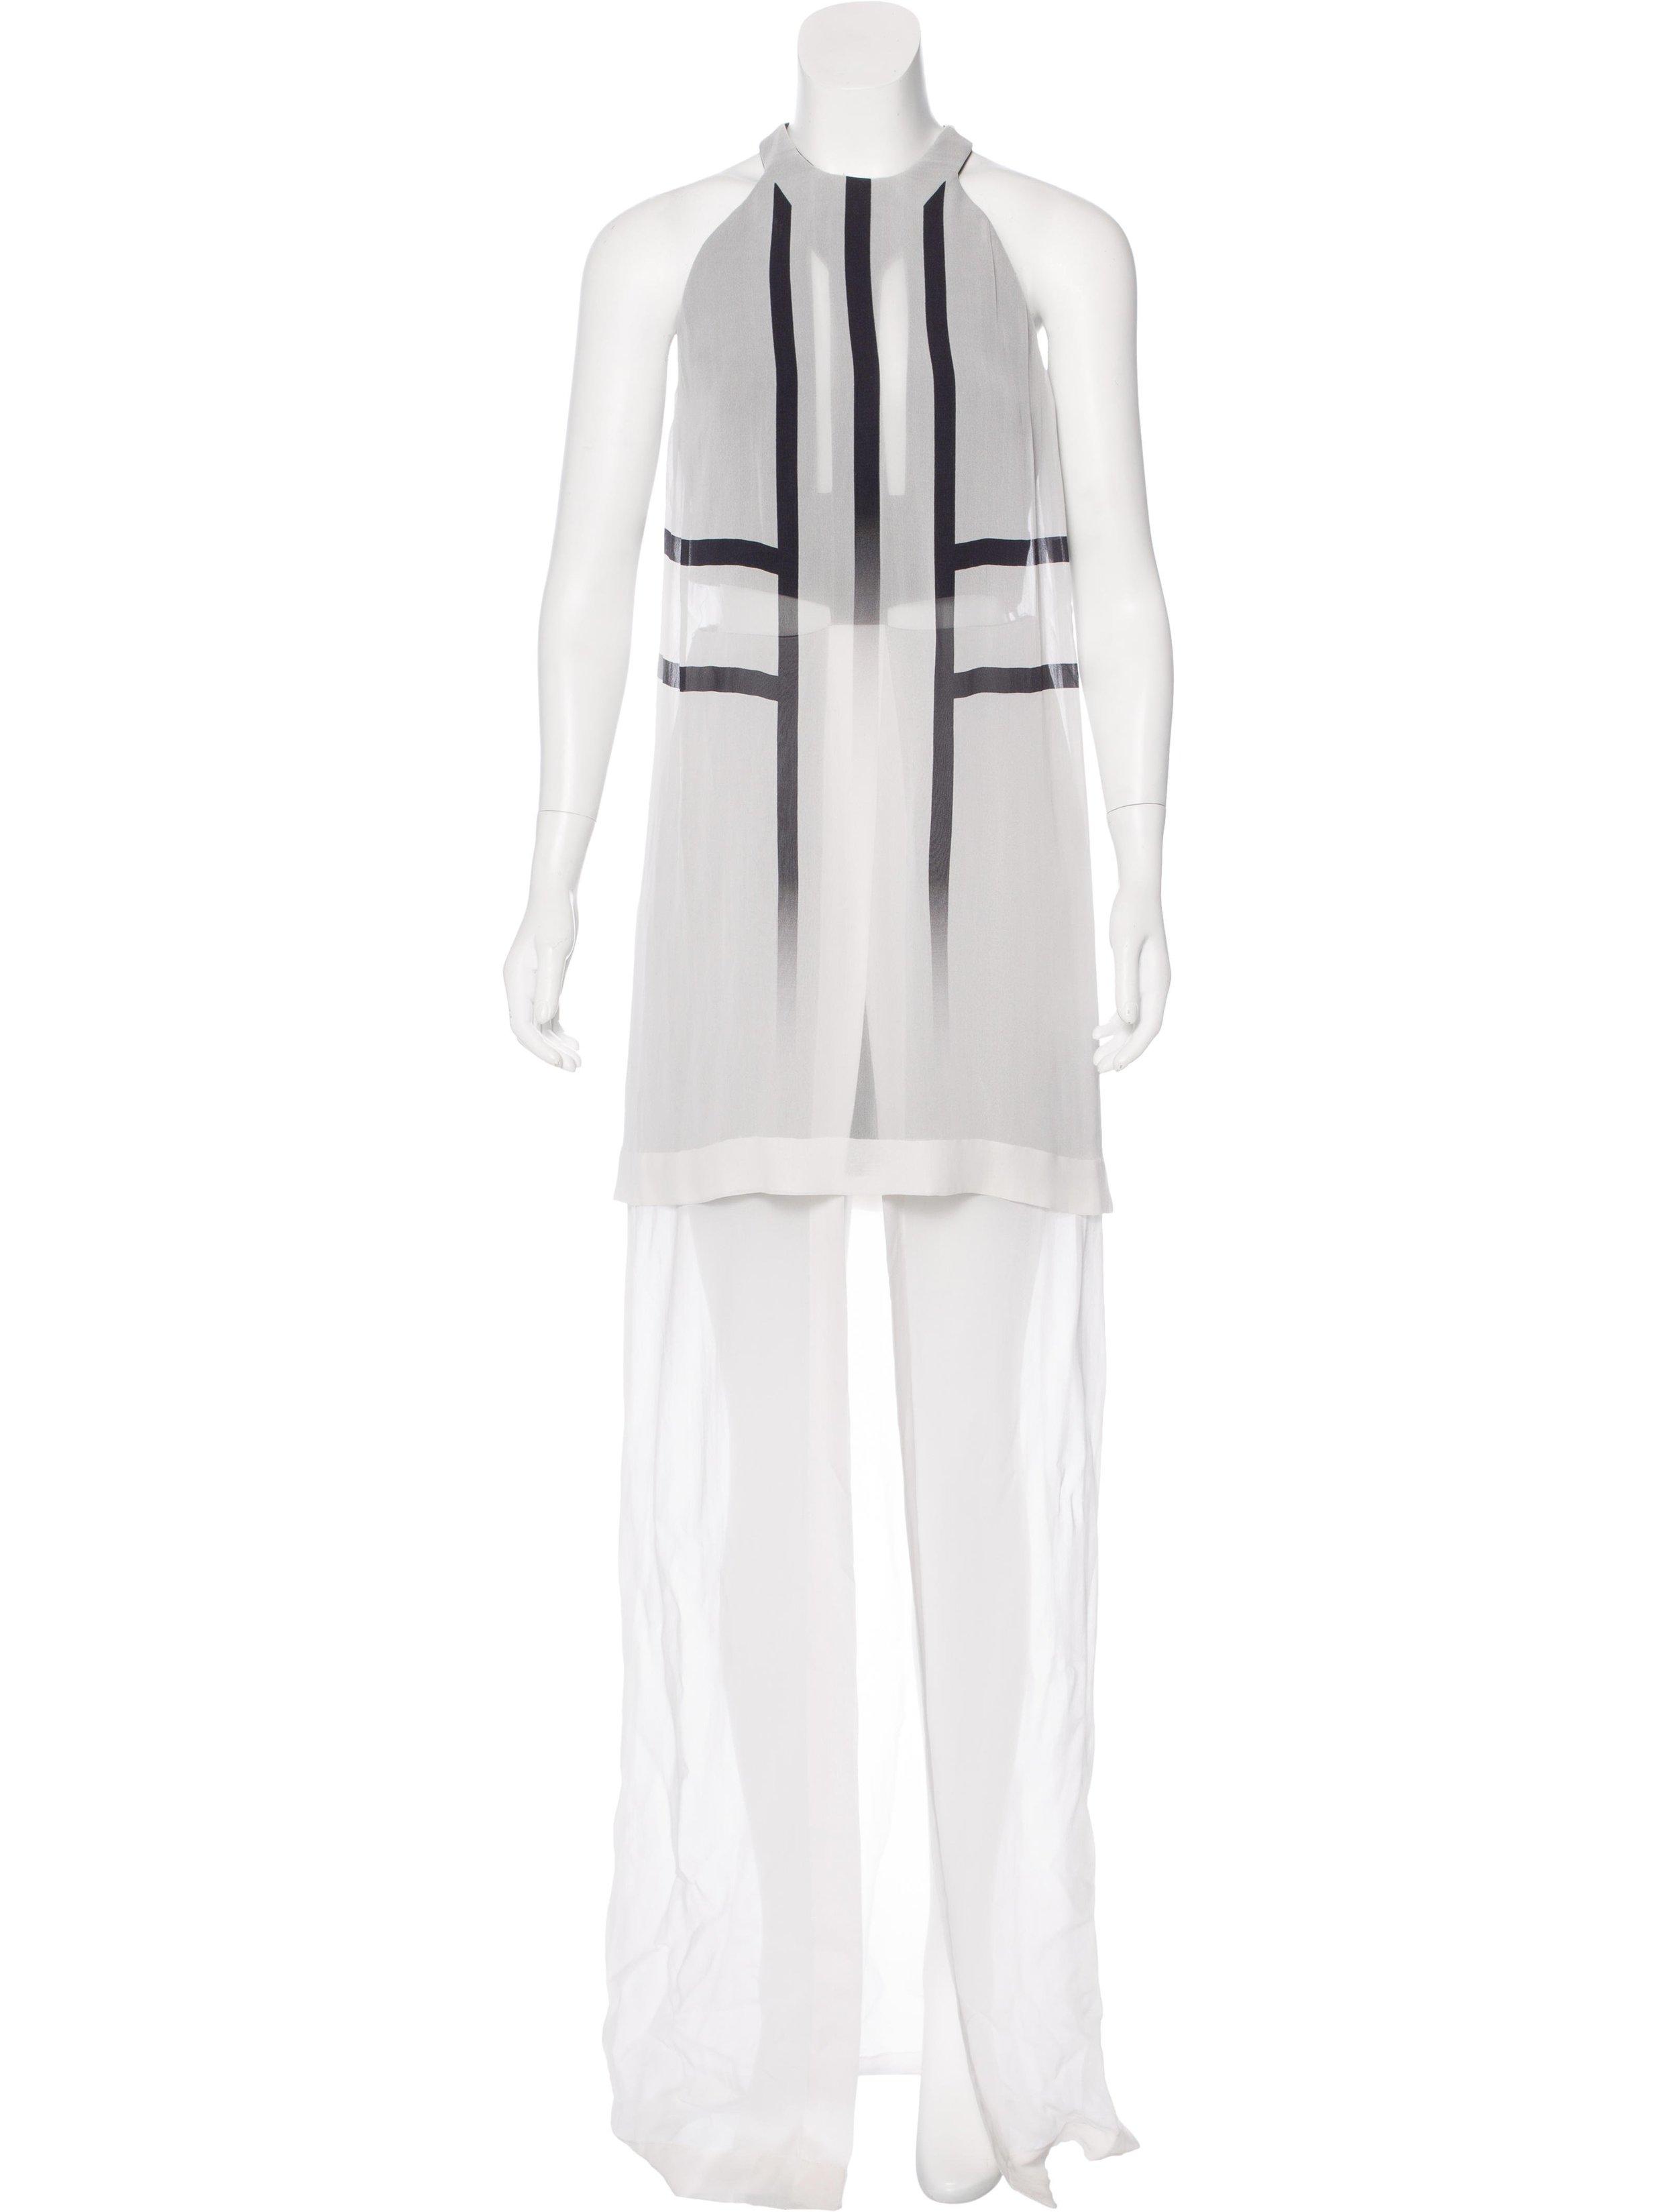 DION LEE SILK EXO PRINT DRESS; Size: M, US6, UK10; $285.00